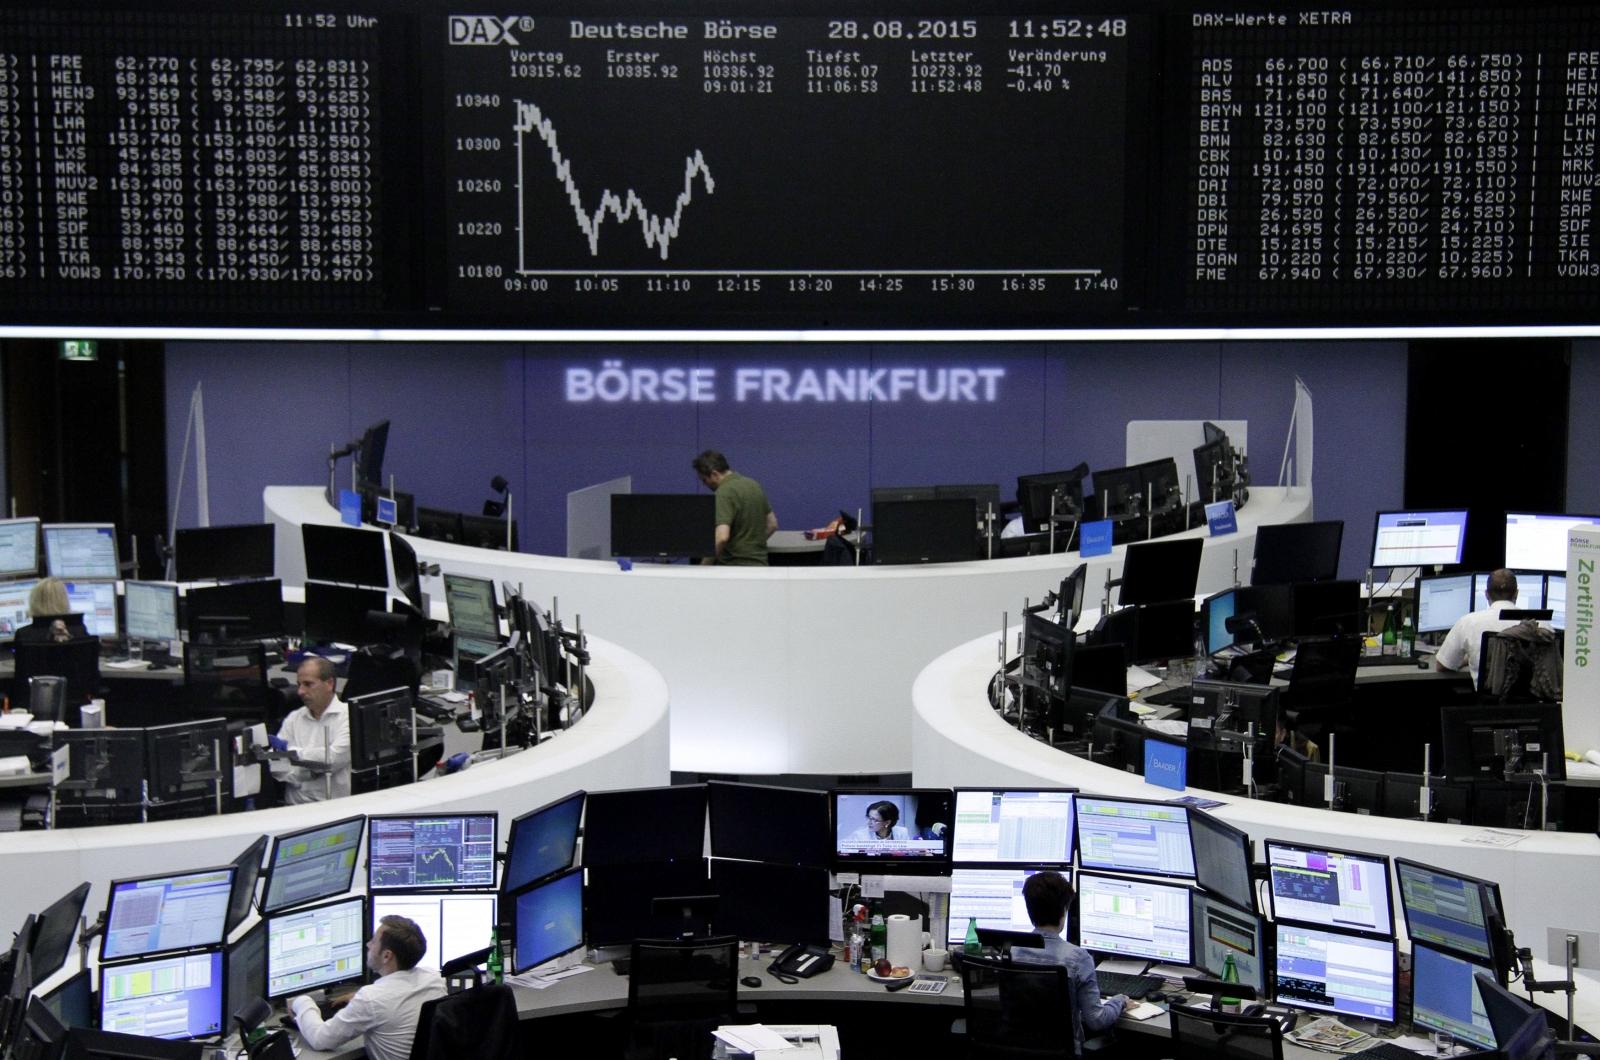 Borse Frankfurt